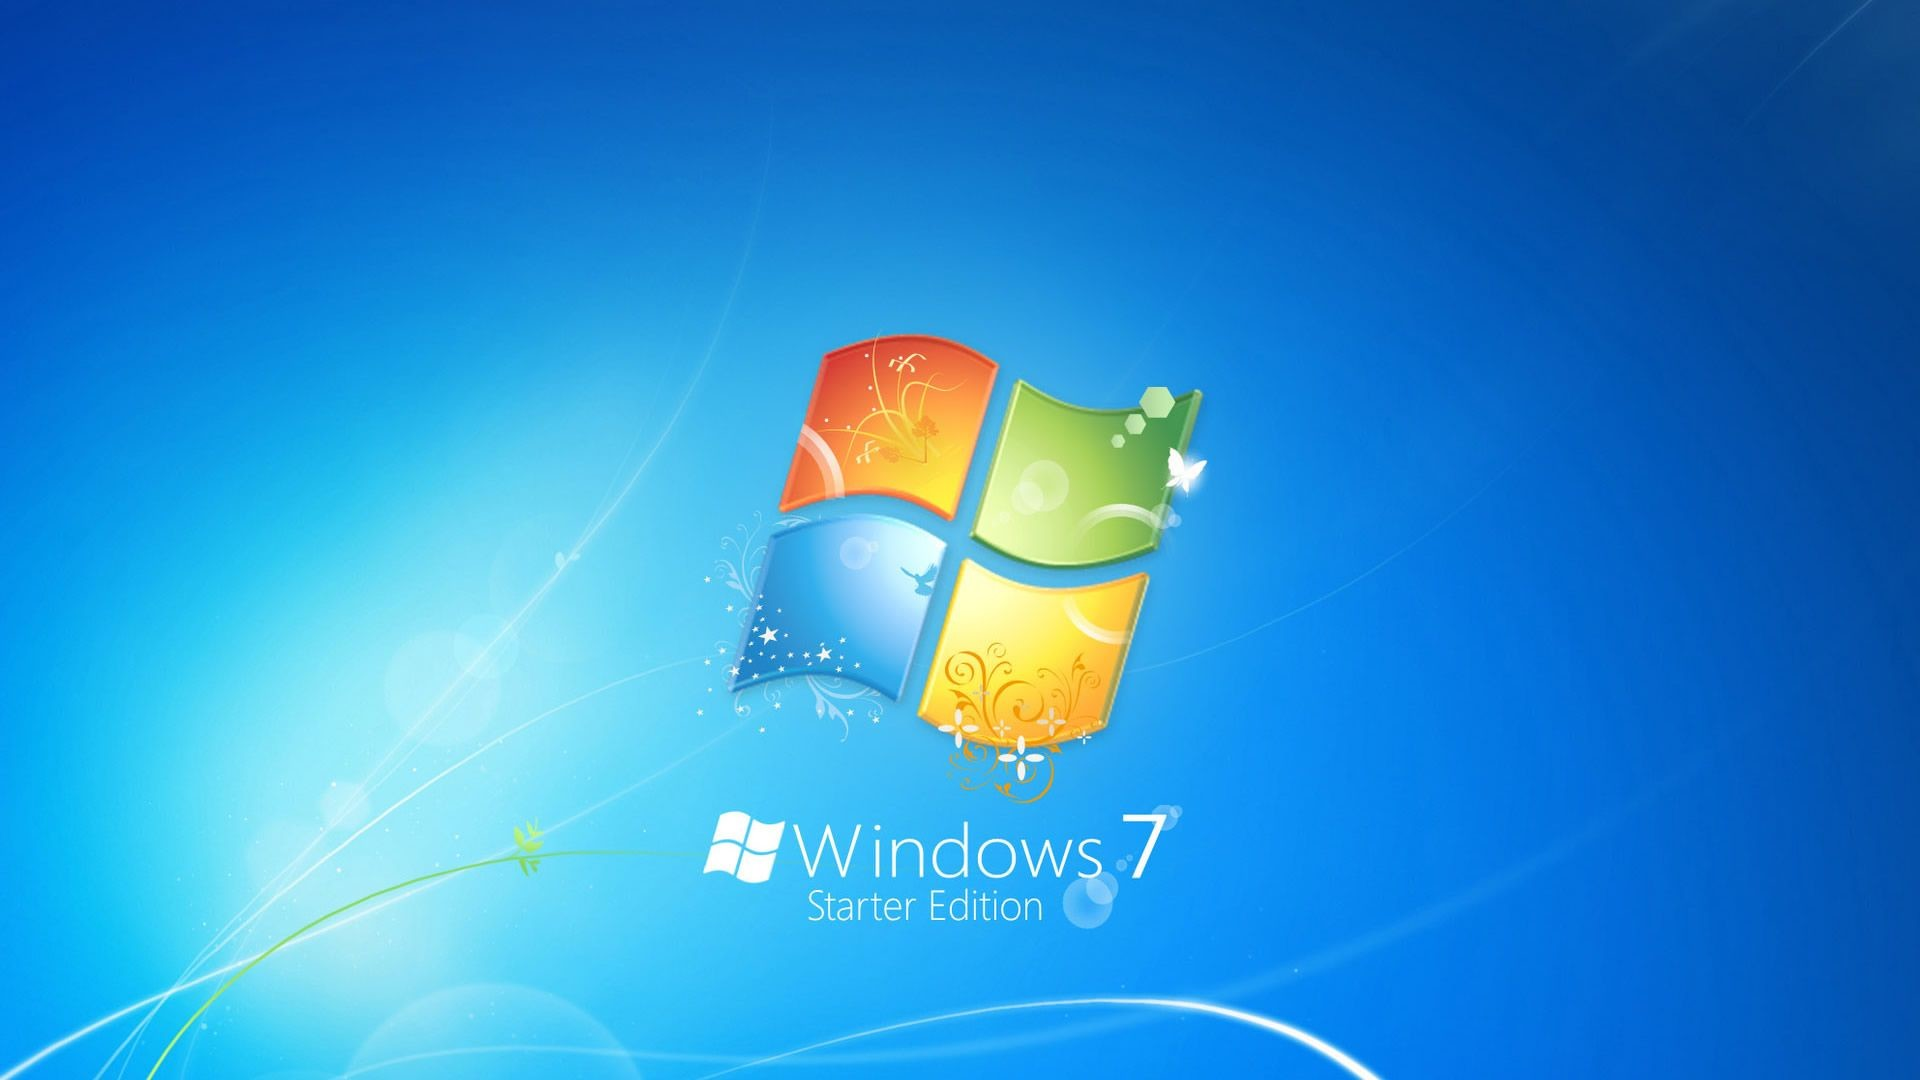 Windows Xp Pro Wallpaper 42 Pictures